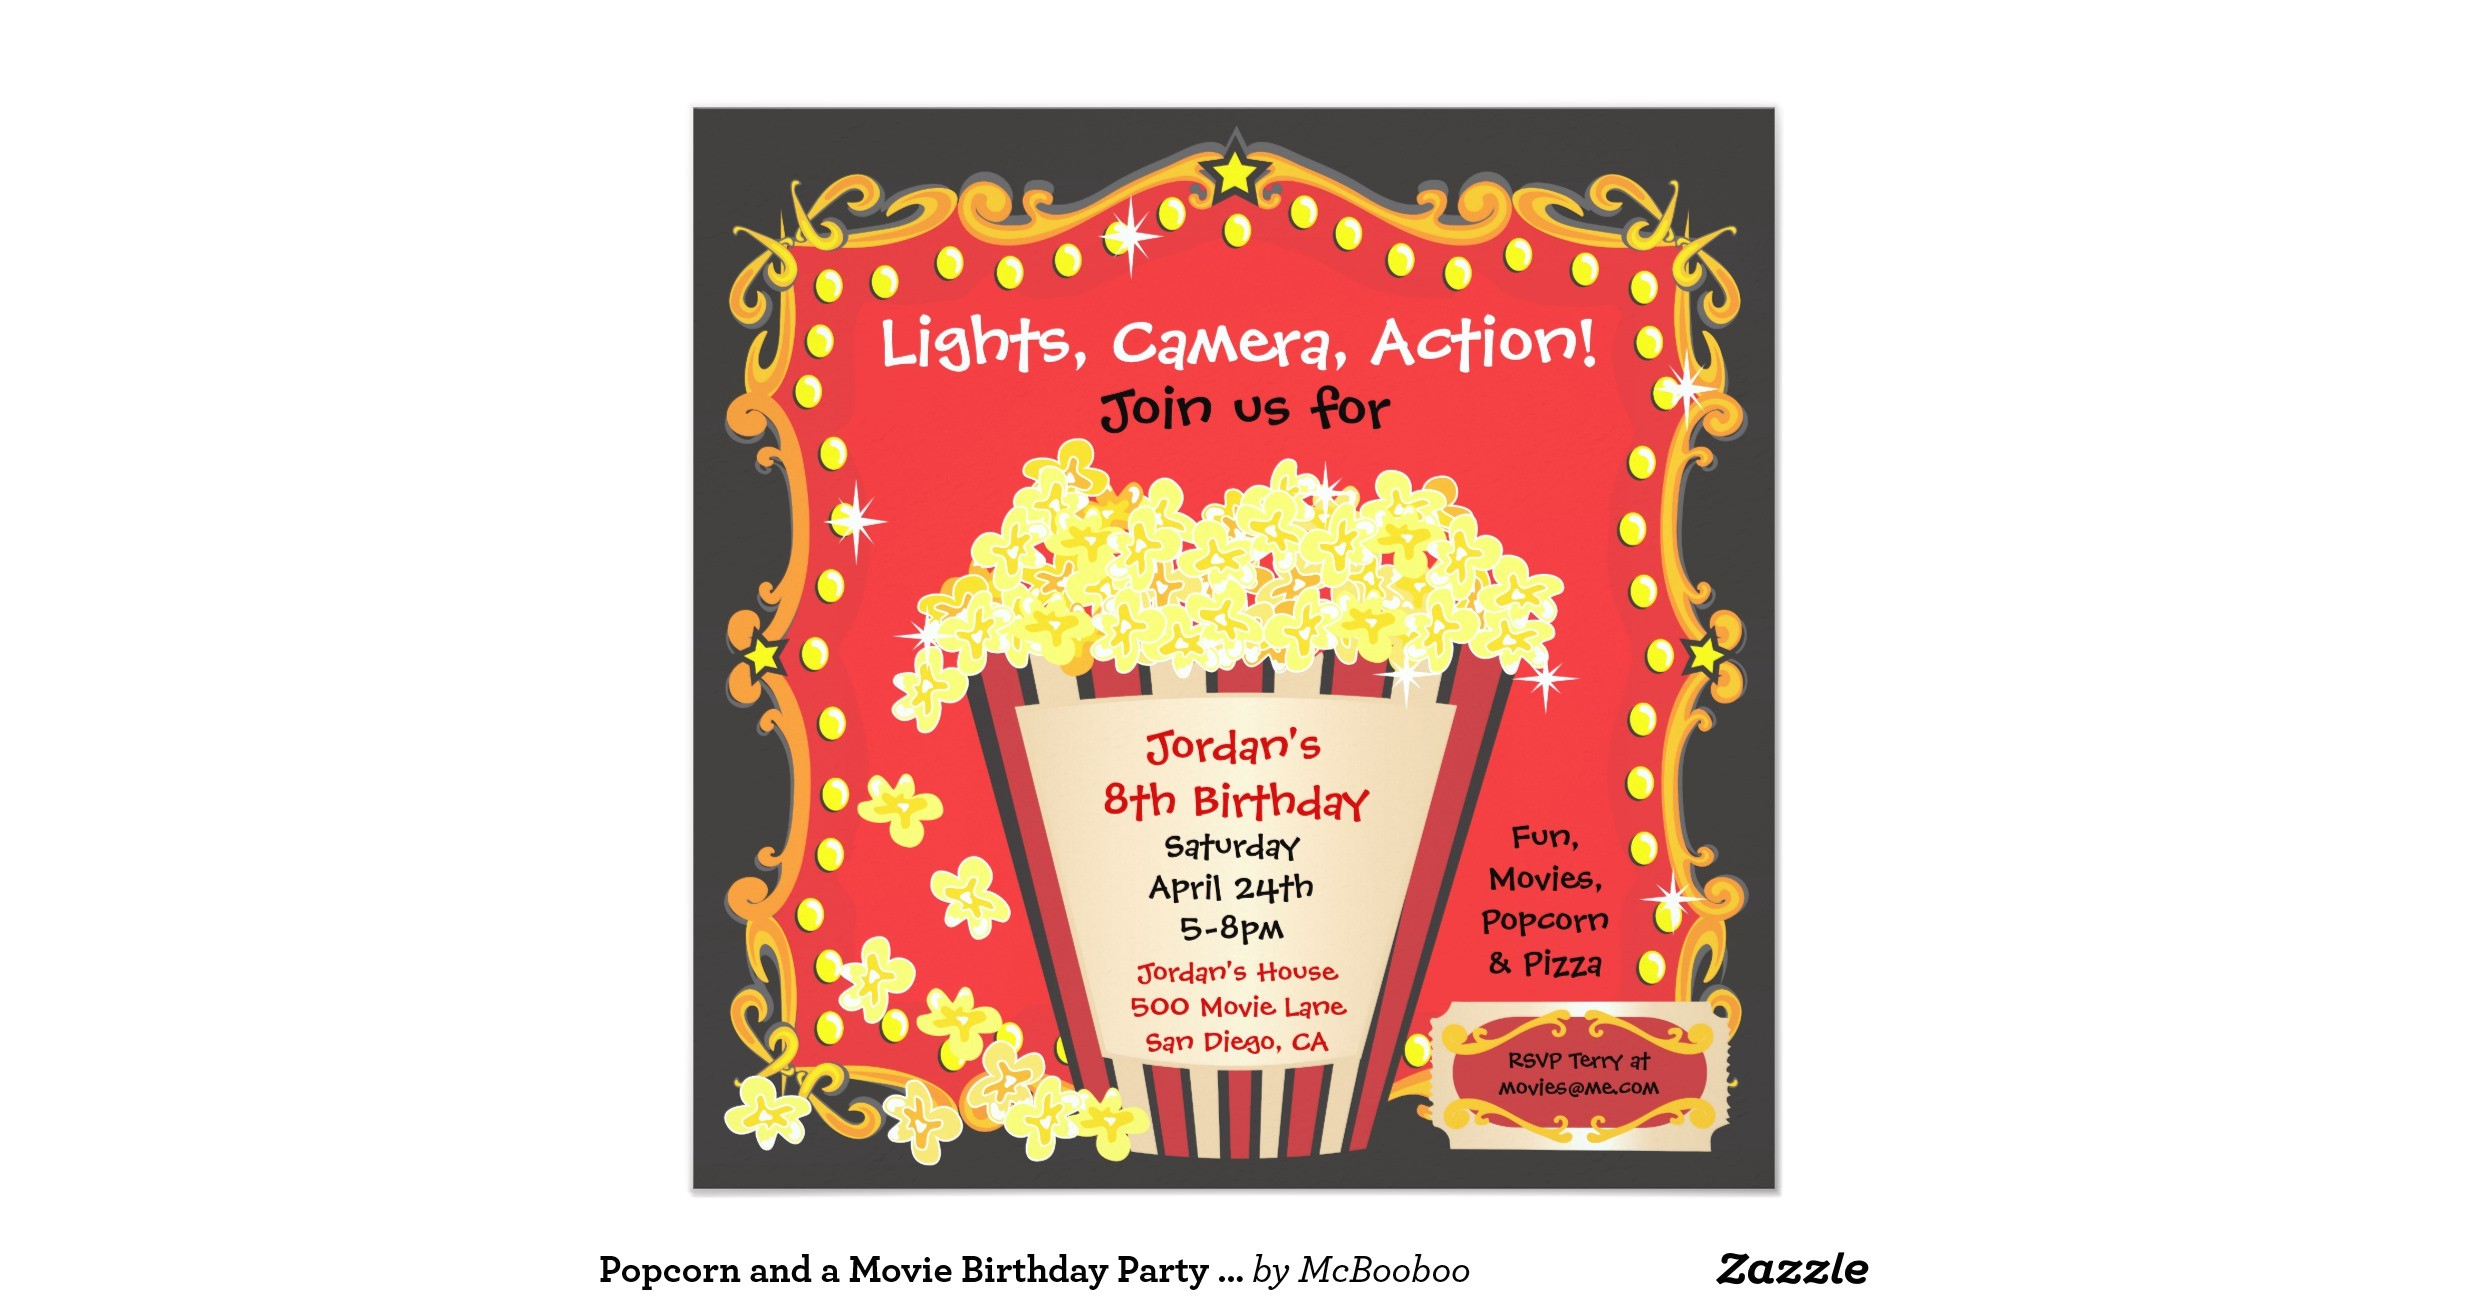 popcorn and a movie birthday party invitation 161377469225495268